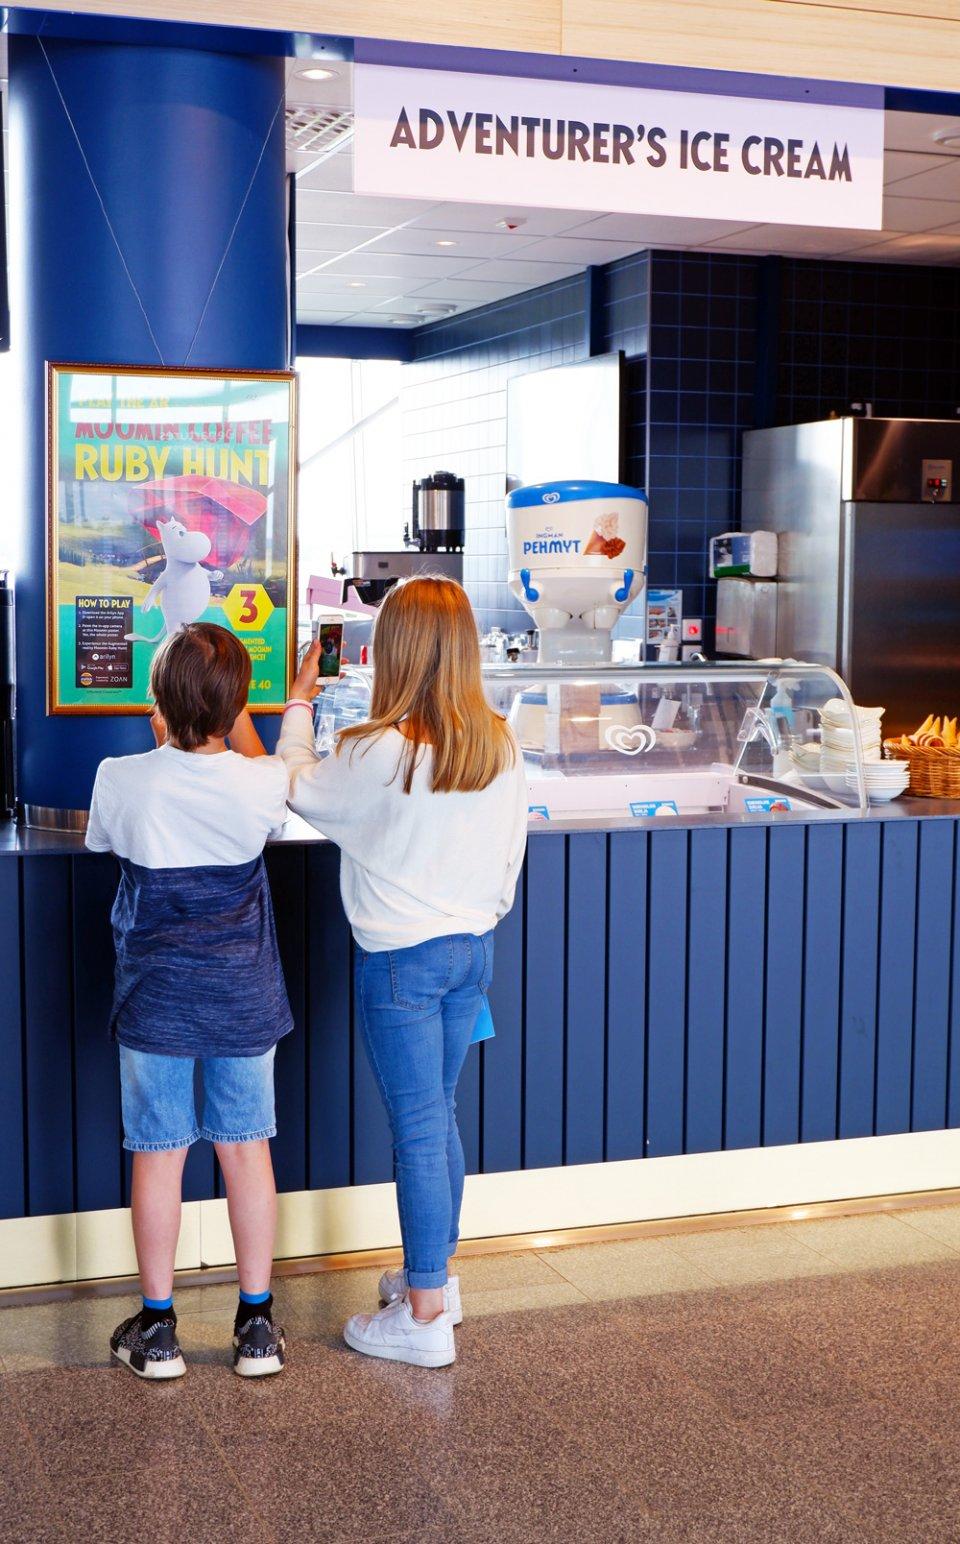 Moomin_Coffee_Helsinki_Airport_Moominhouse_Counter_Ruby_Hunt-960x1544